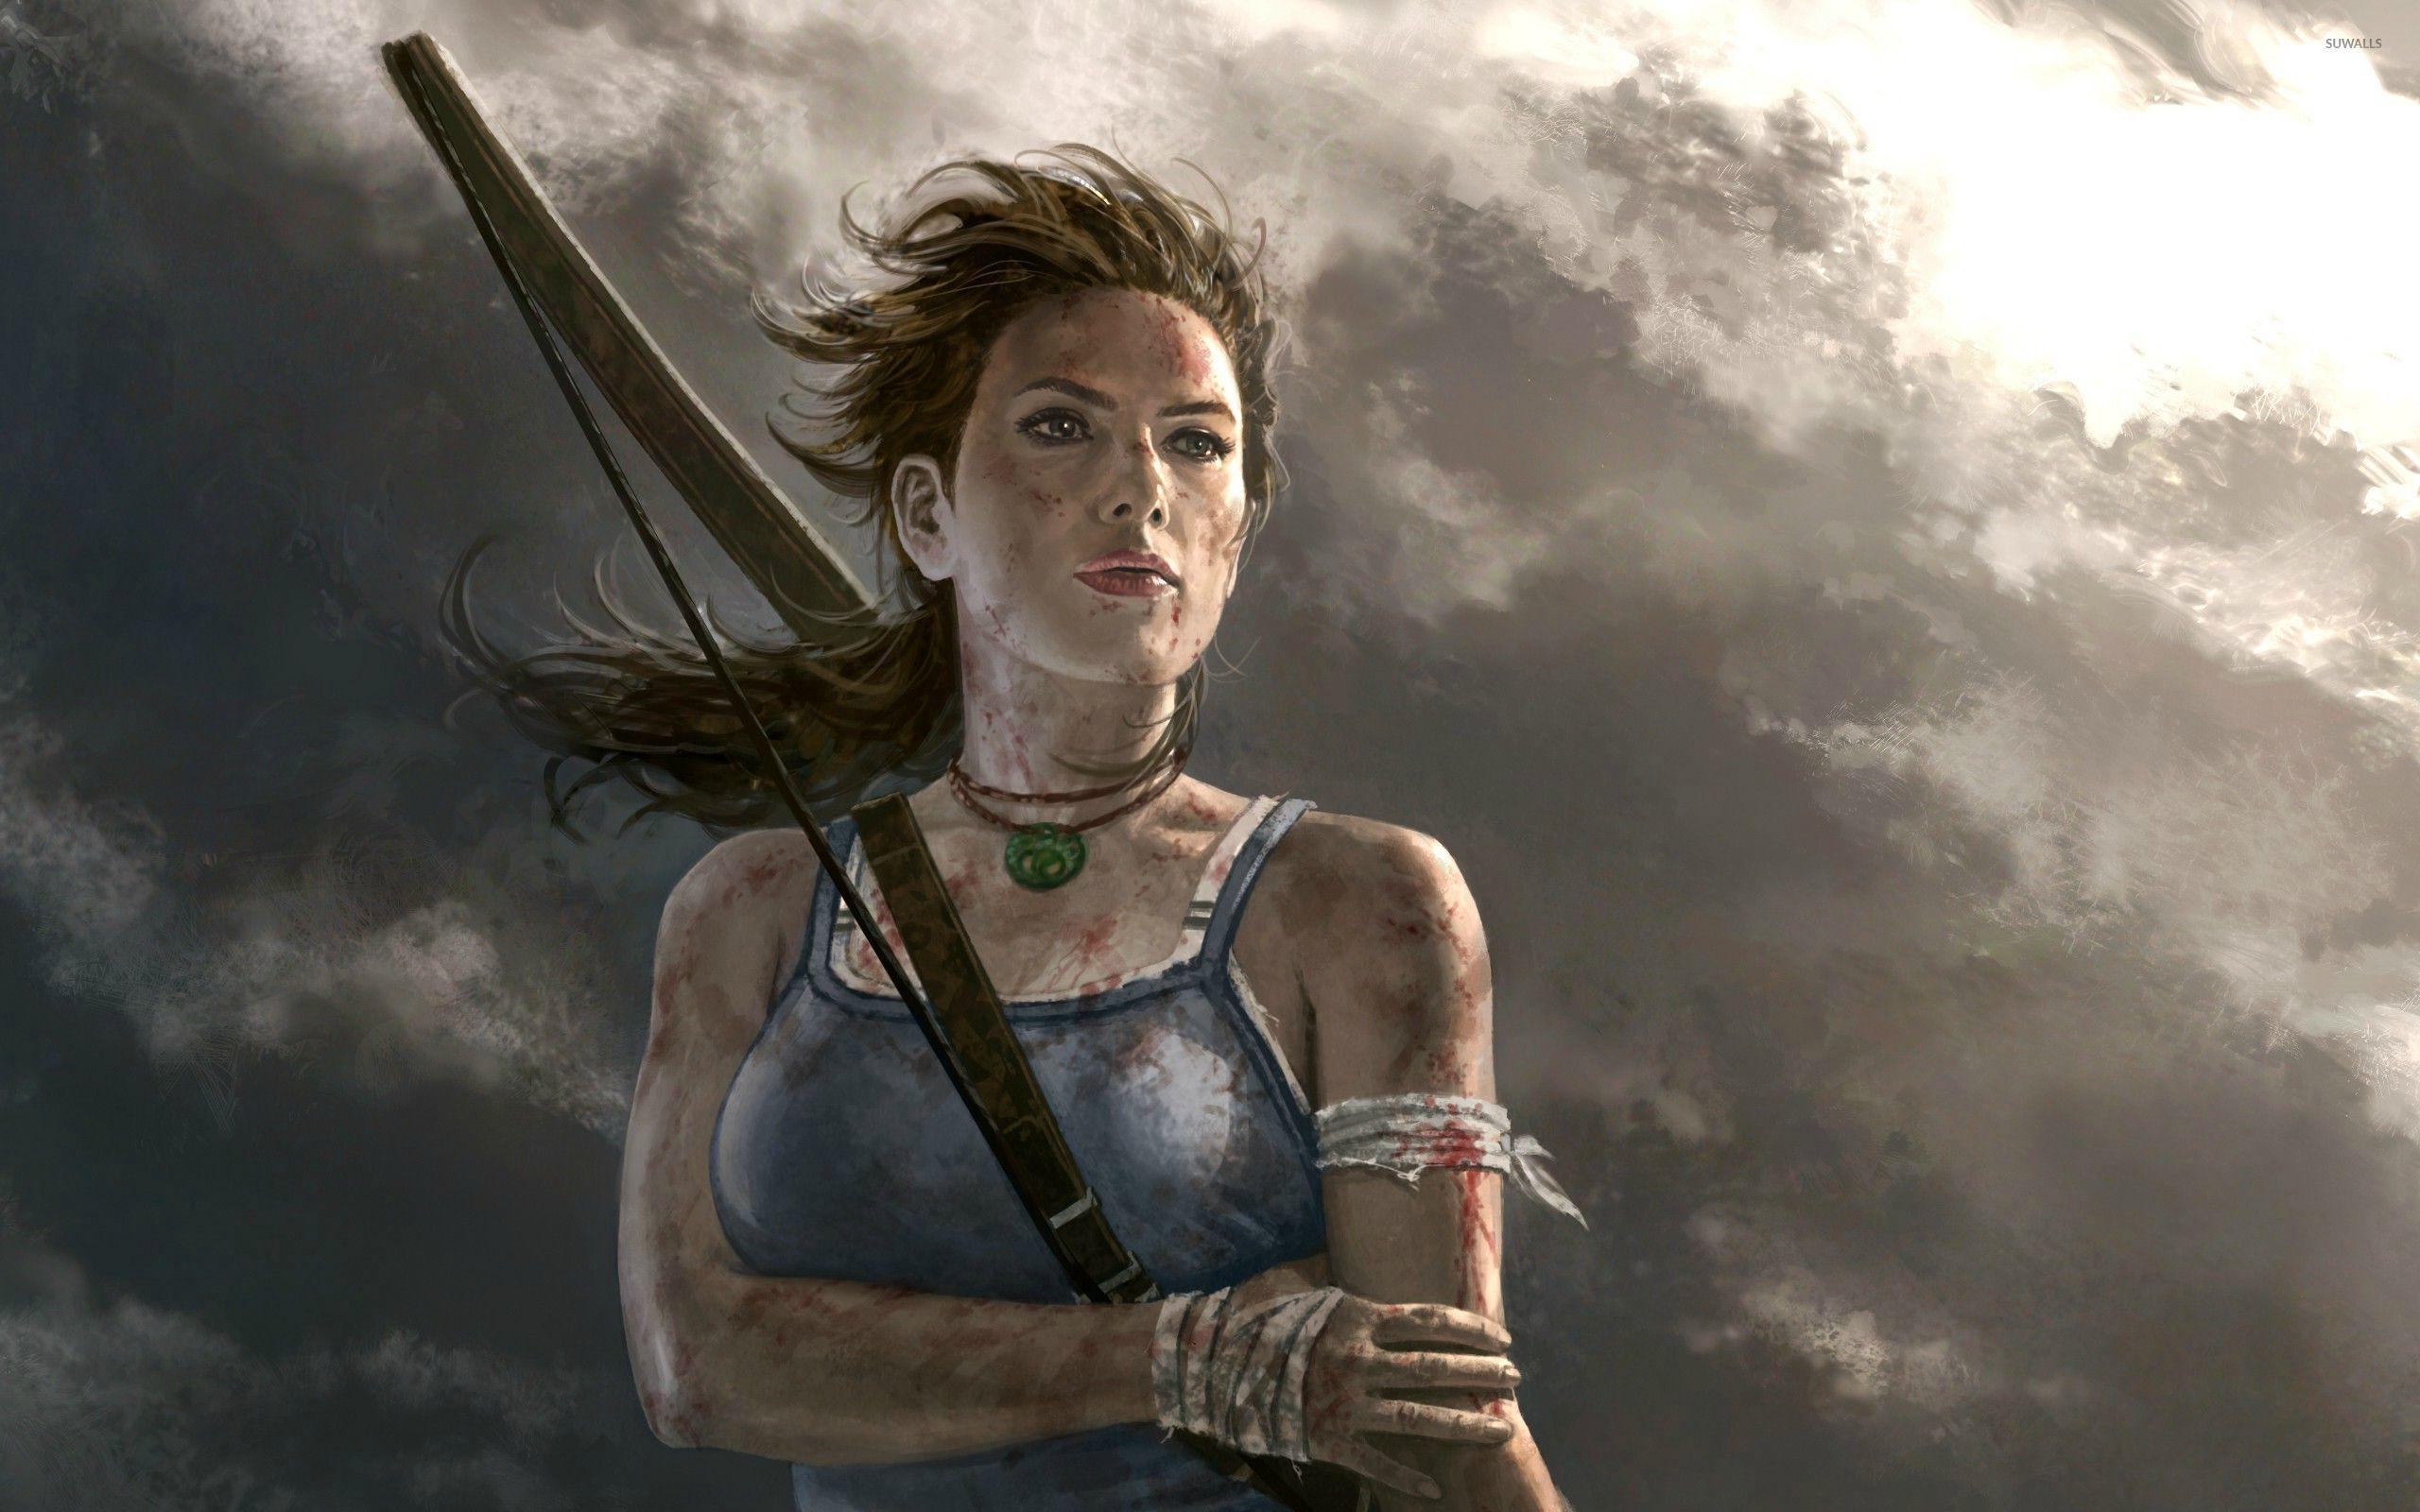 Broken Hearted Girl Wallpaper Lara Croft Tomb Raider 10 Wallpaper Game Wallpapers